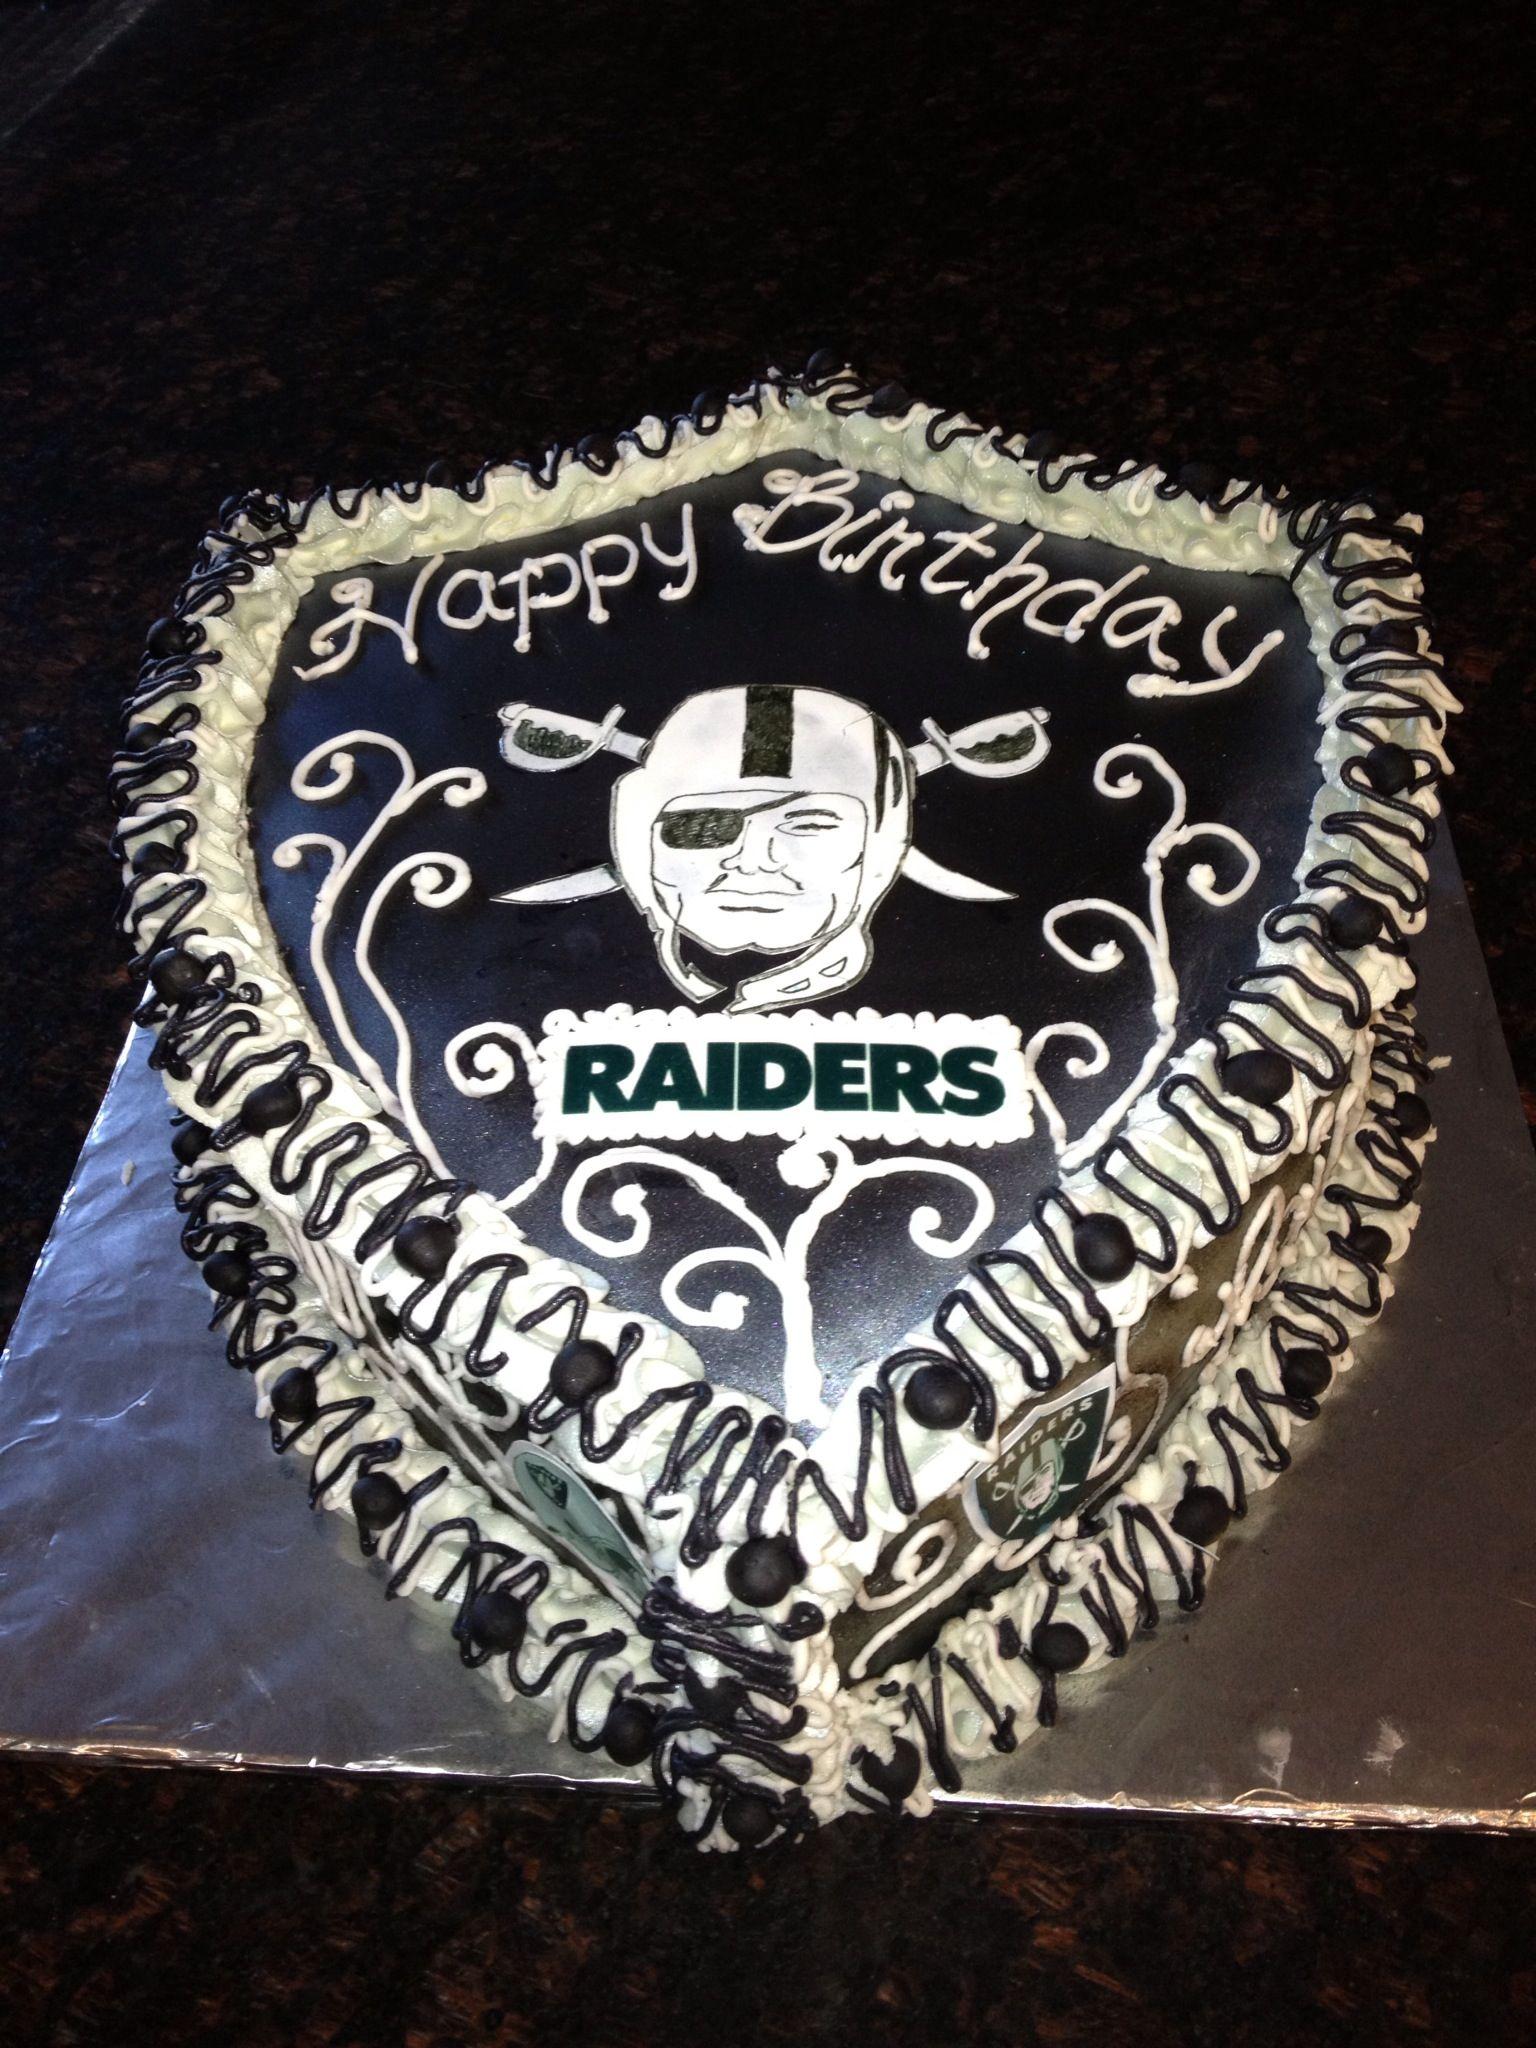 Michelle For Reals Pleeeeeeeease Make Me My Raiders Cake